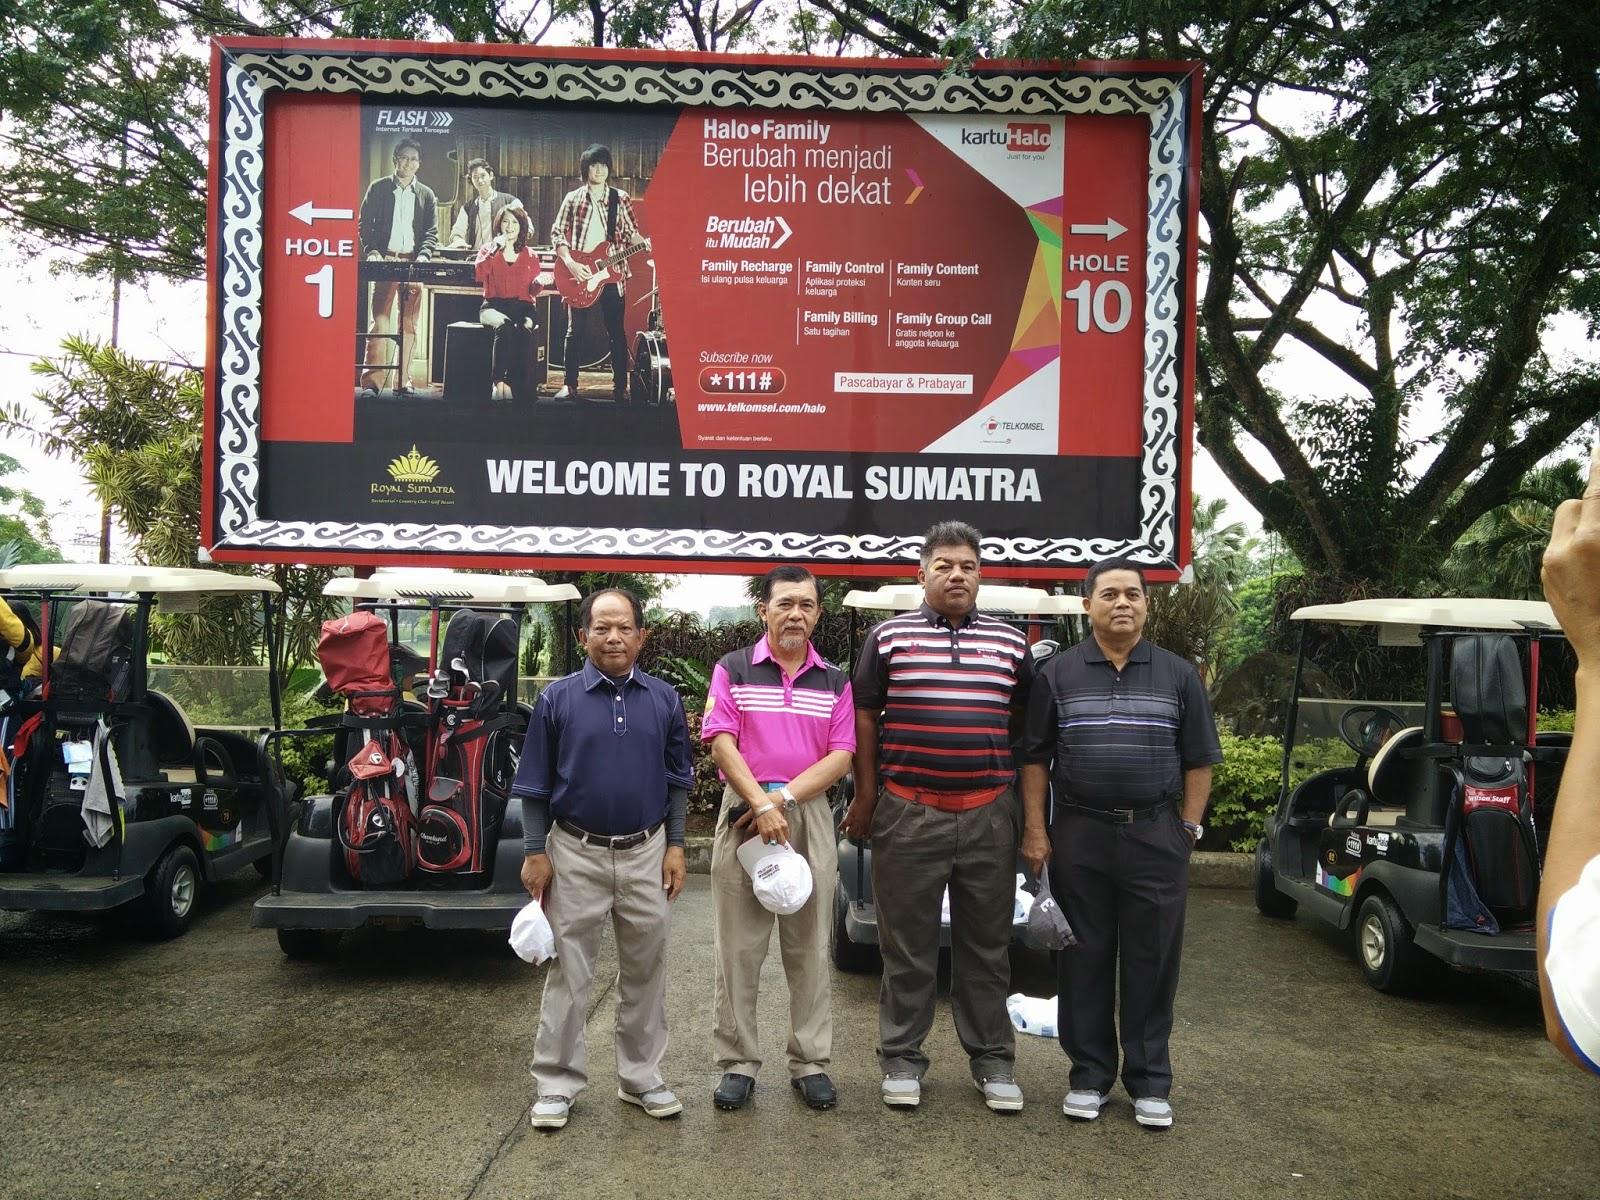 all new alphard 2017 indonesia kijang innova diesel bangdolah golf destinations: royal sumatra and ...